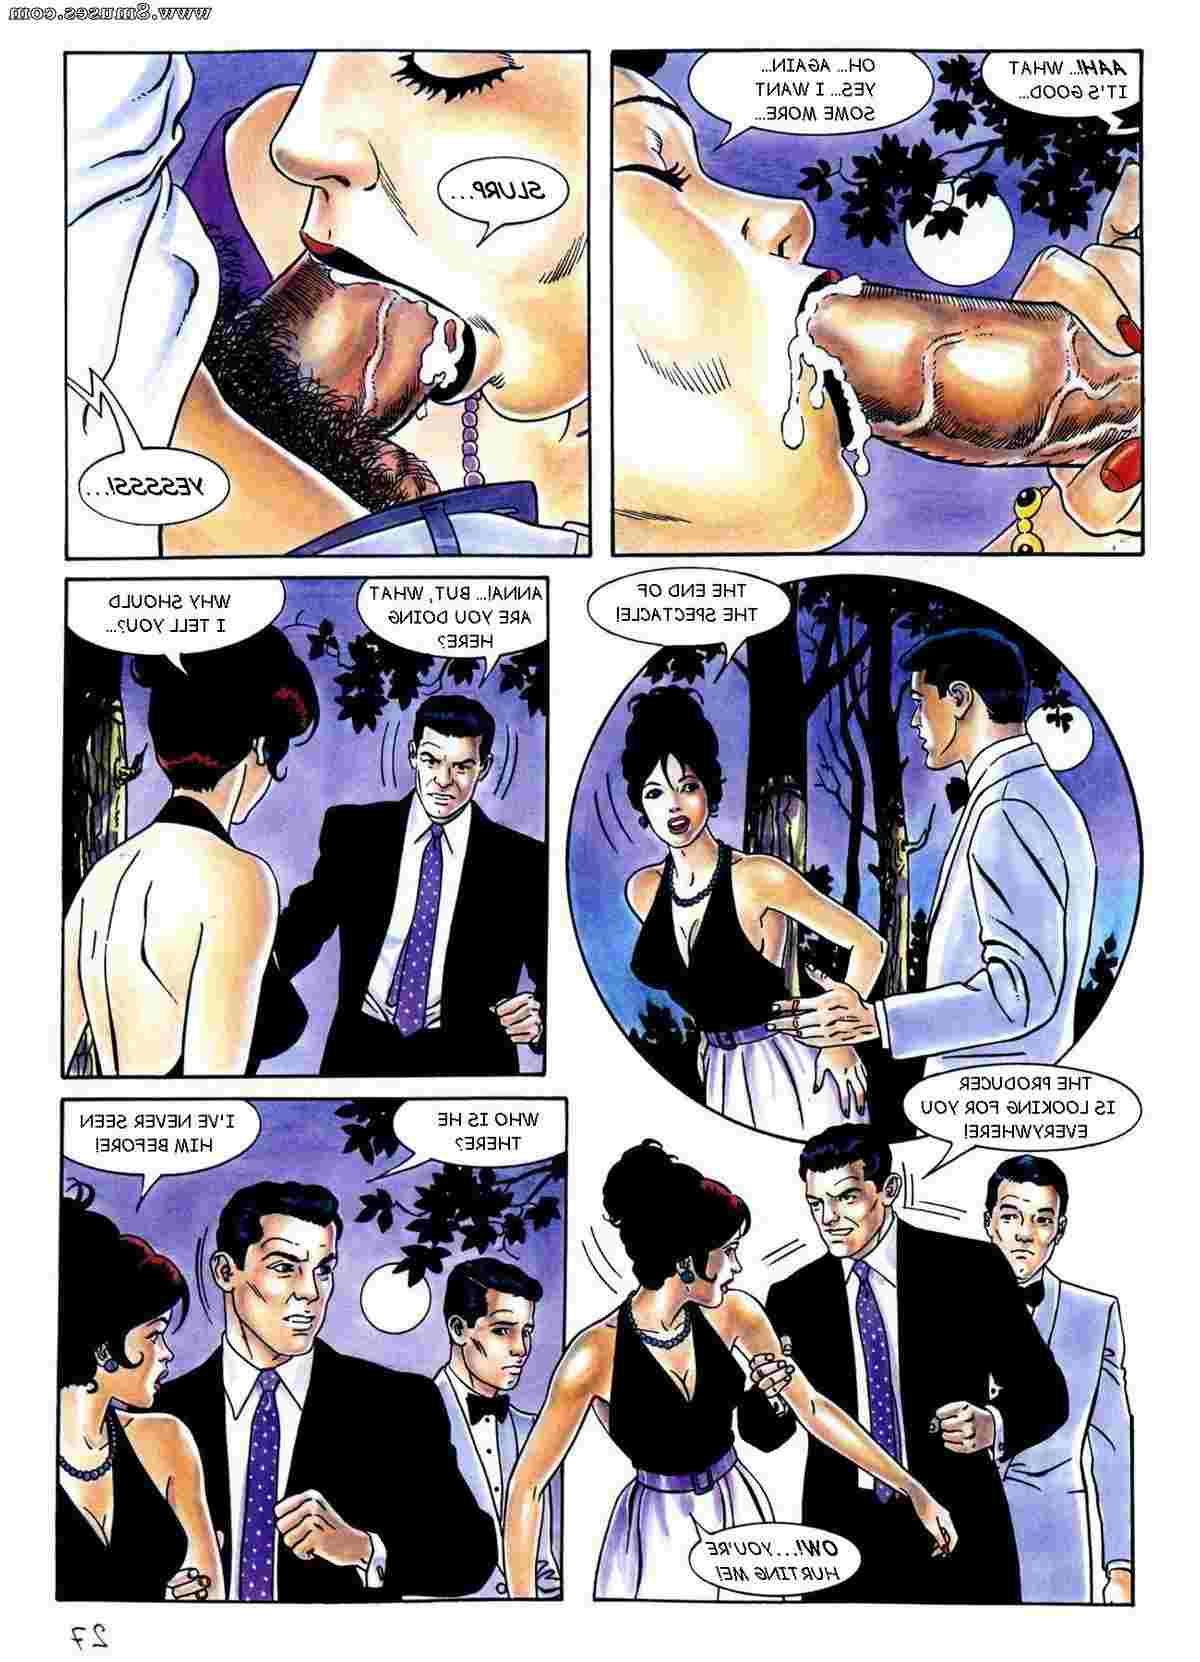 Stramaglia-Morale-Comics/Anna-Perverted-Innocence Anna_Perverted_Innocence__8muses_-_Sex_and_Porn_Comics_30.jpg